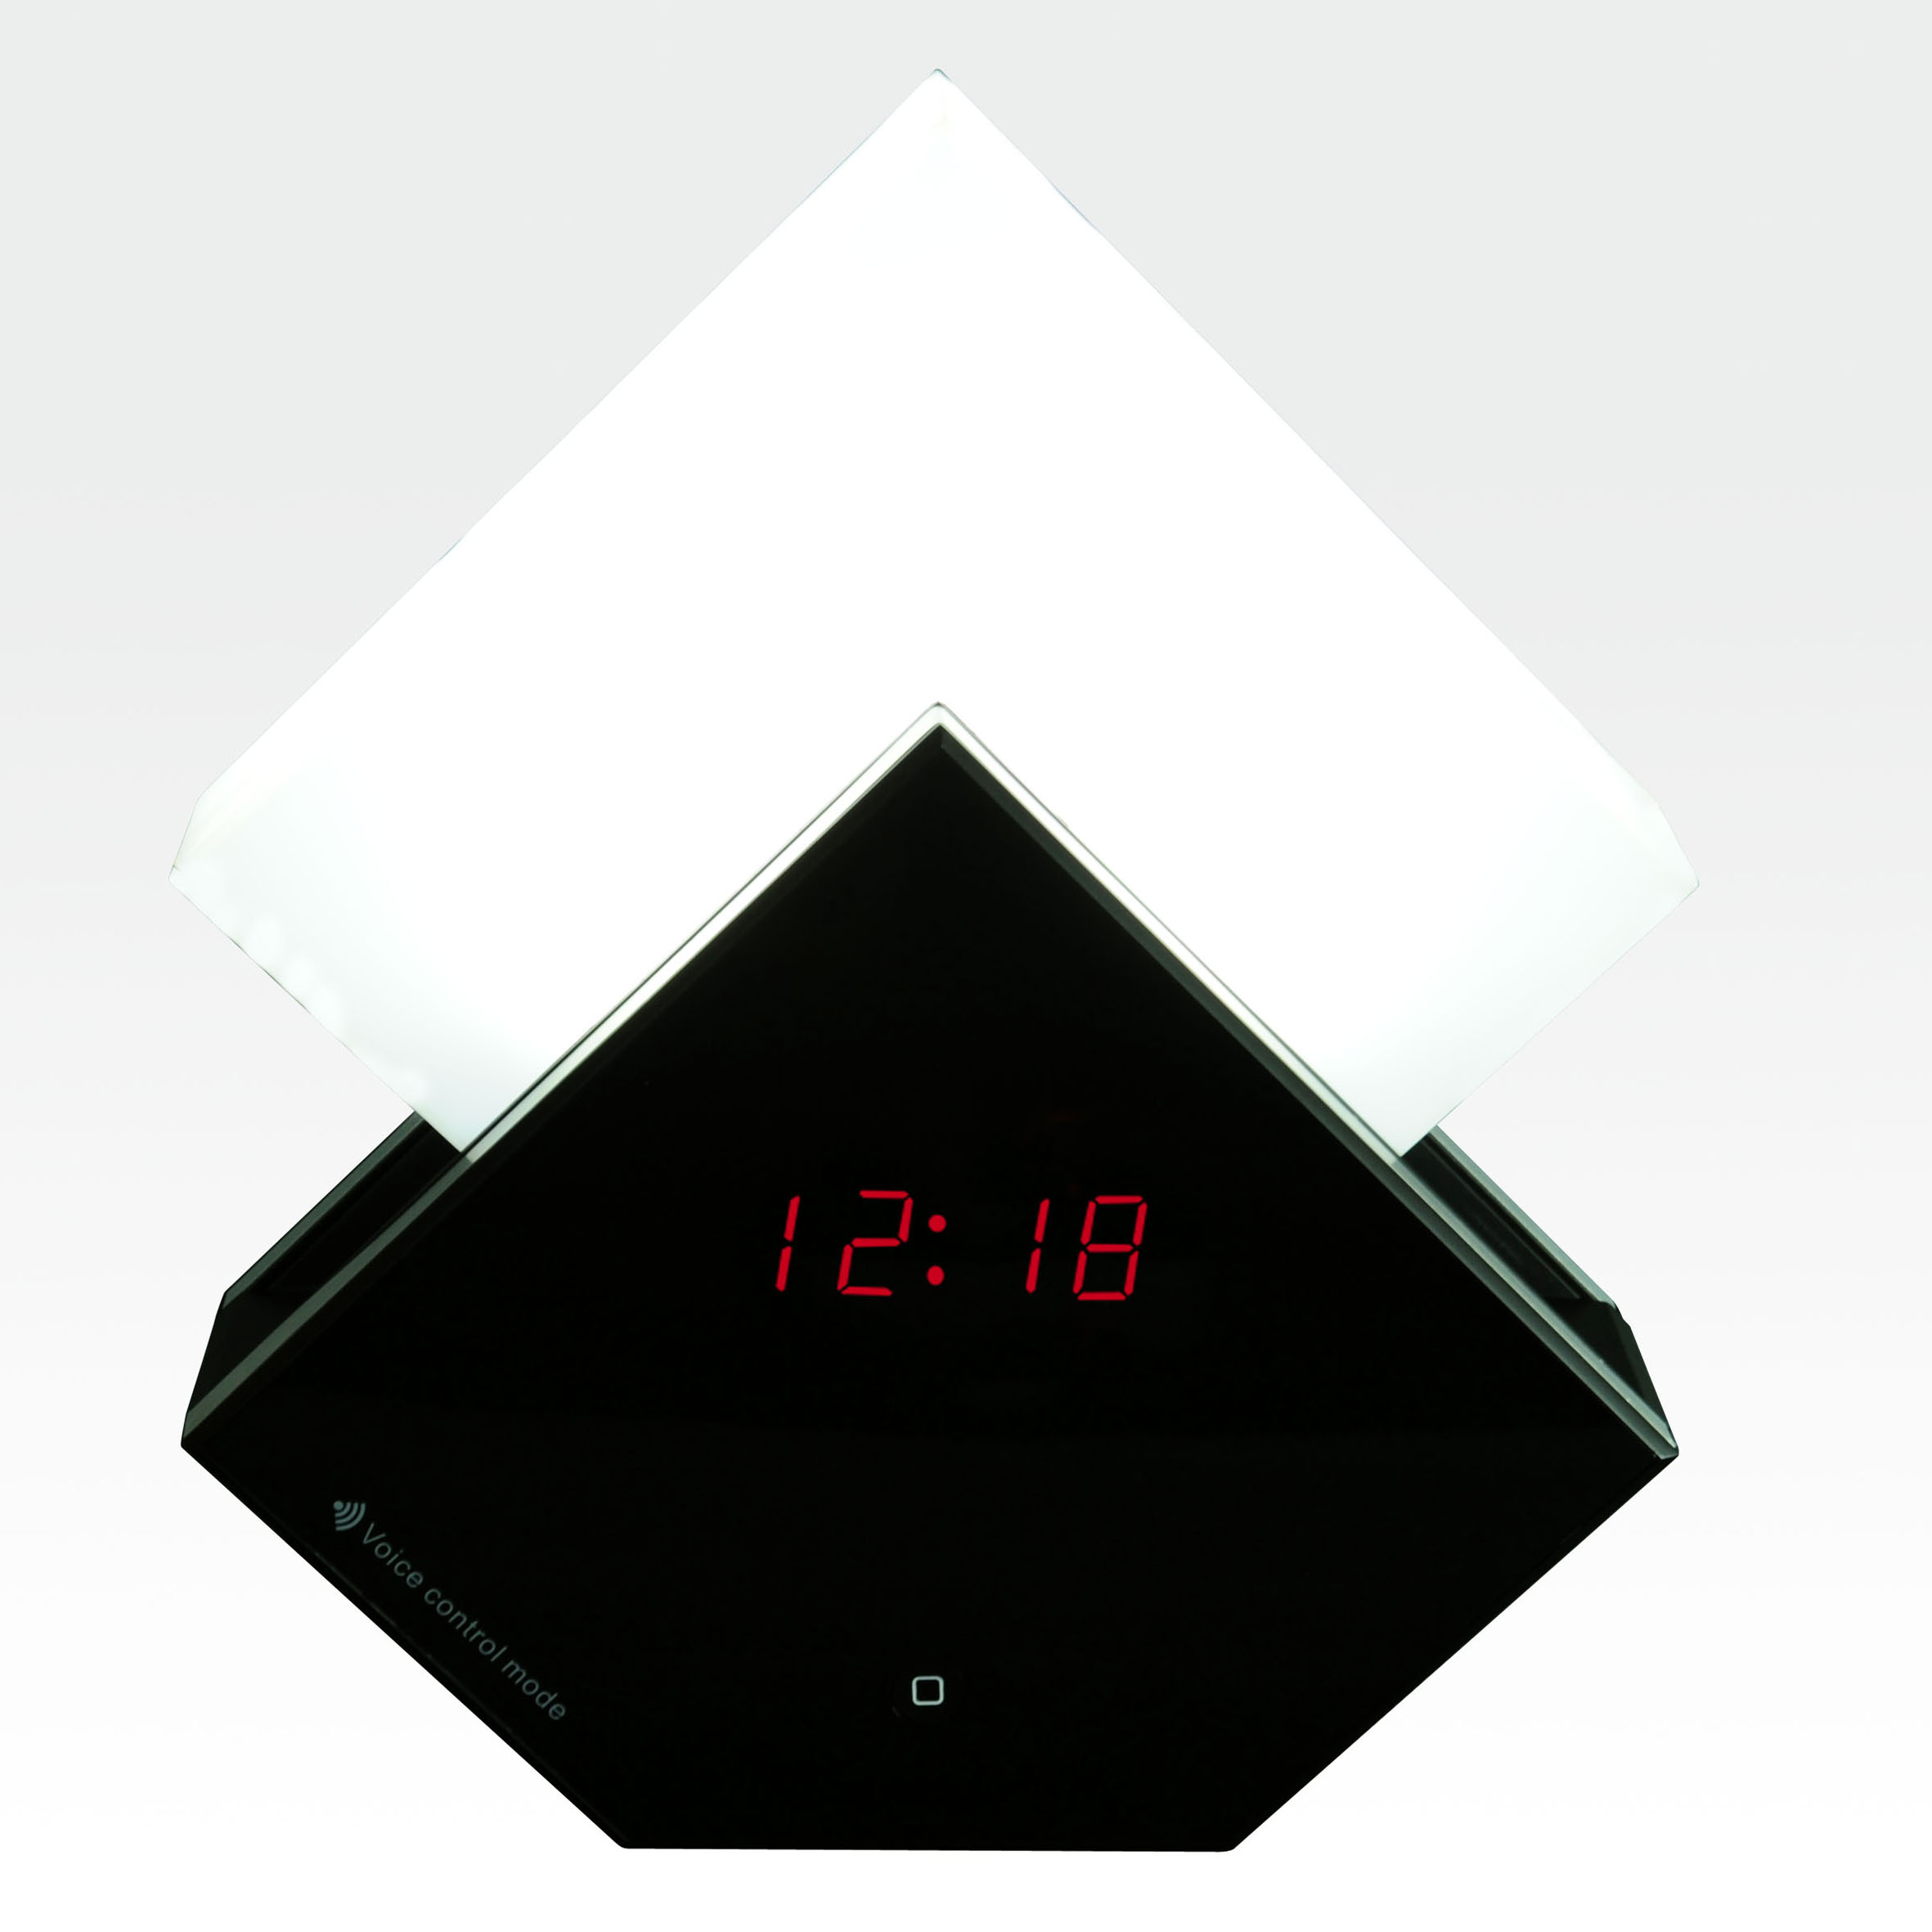 precorn onlineshop multicolor touch led lampe nachttischlampe wecker schlummer dimm licht. Black Bedroom Furniture Sets. Home Design Ideas